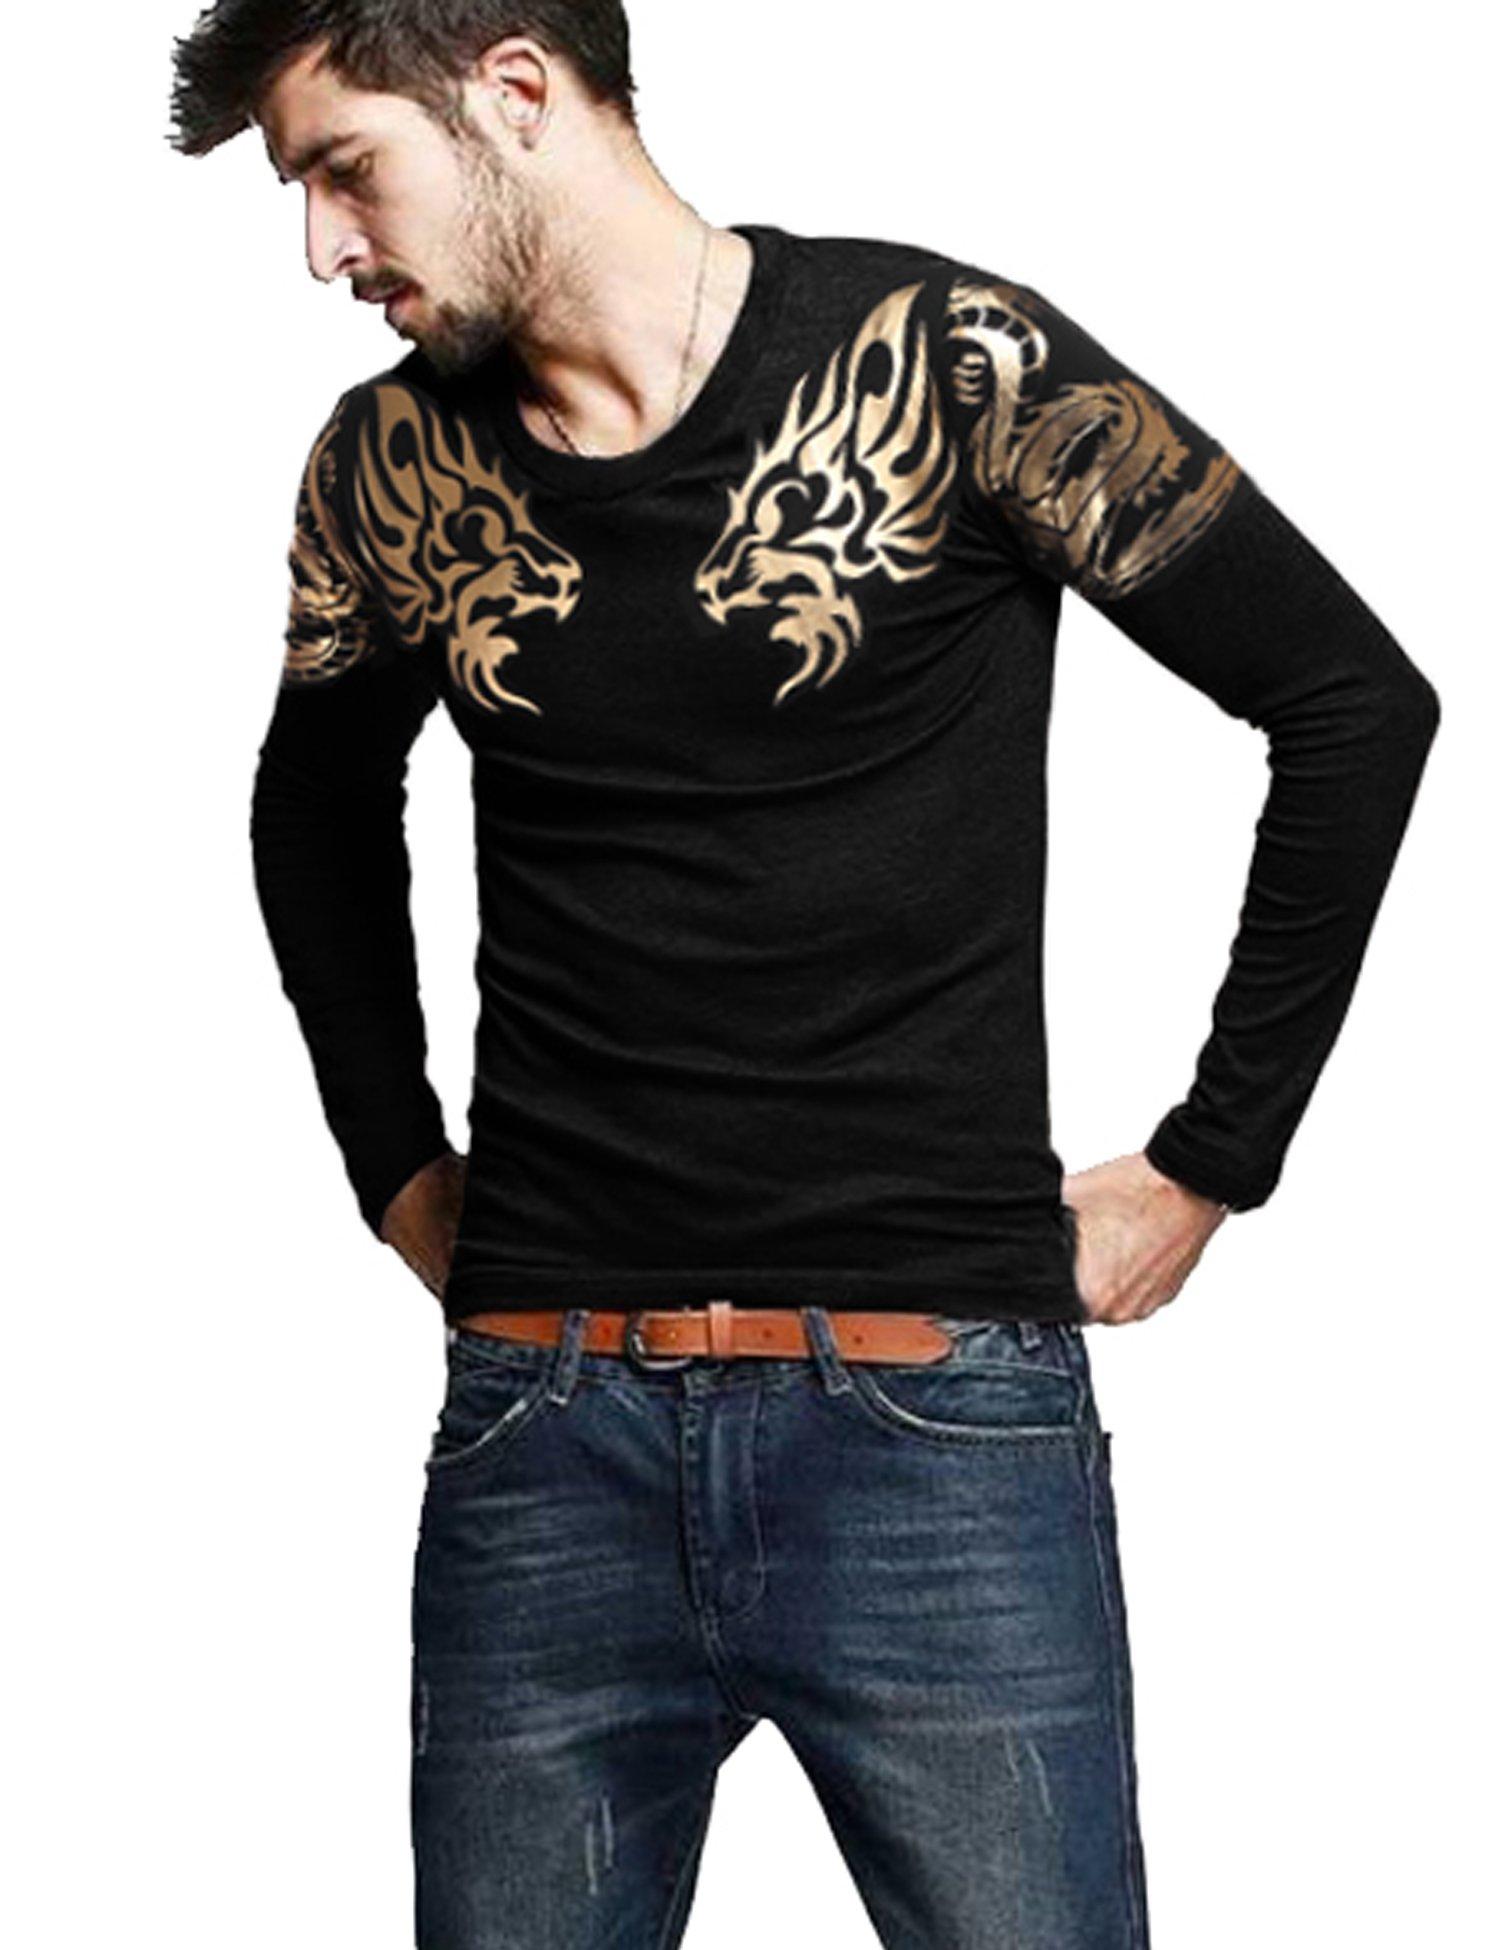 COOFANDY Mens Print Tees Dragon Graphic Long Sleeves Fashion T-Shirts Black L by COOFANDY (Image #1)